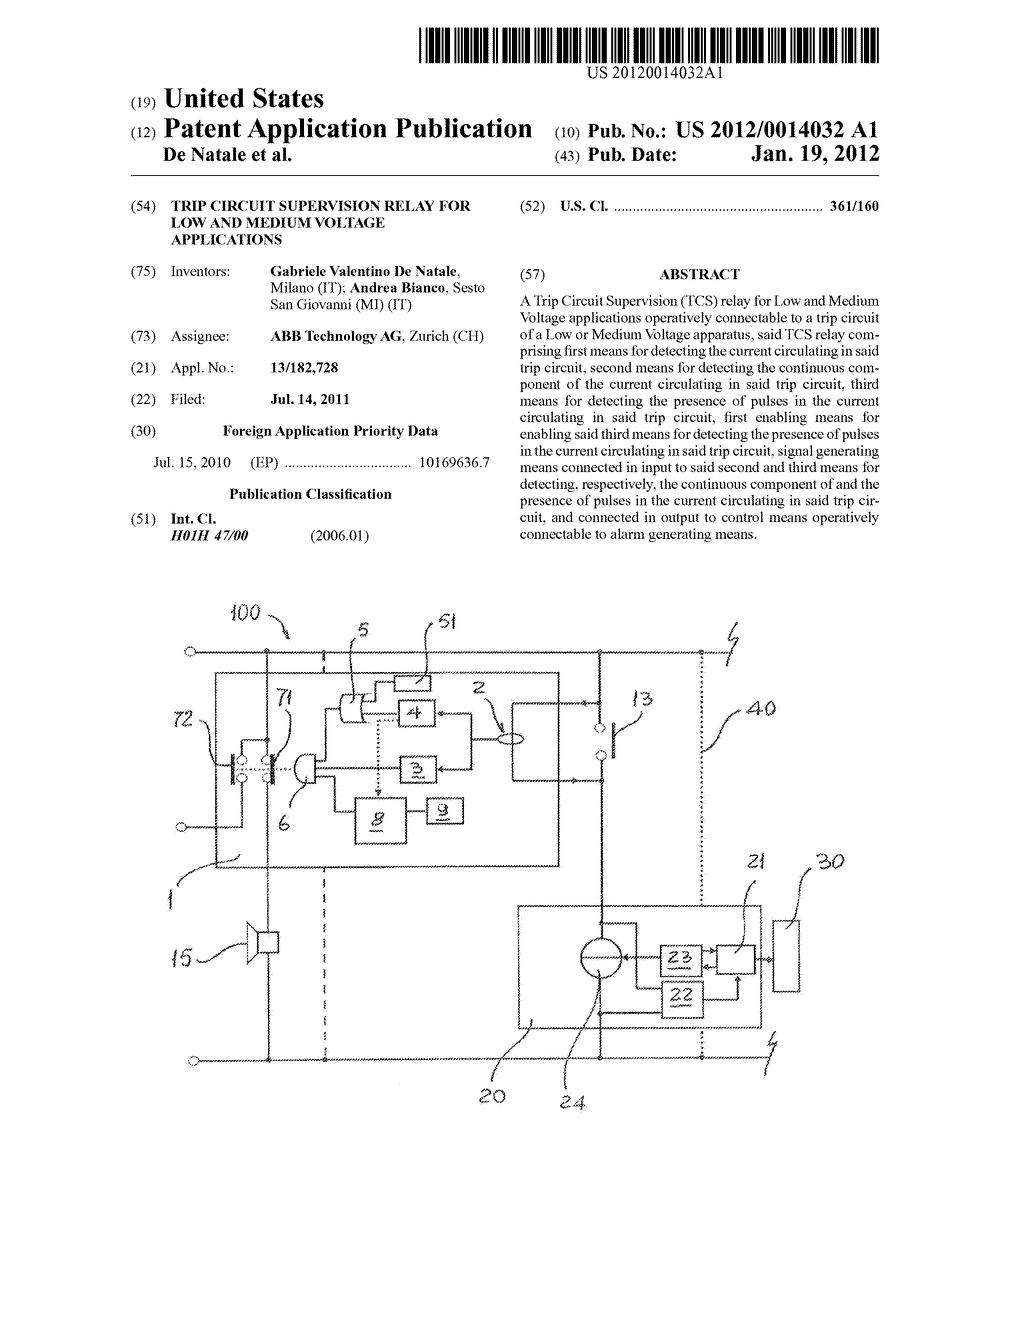 TRIP CIRCUIT SUPERVISION RELAY FOR LOW AND MEDIUM VOLTAGE - Relay circuit diagram design